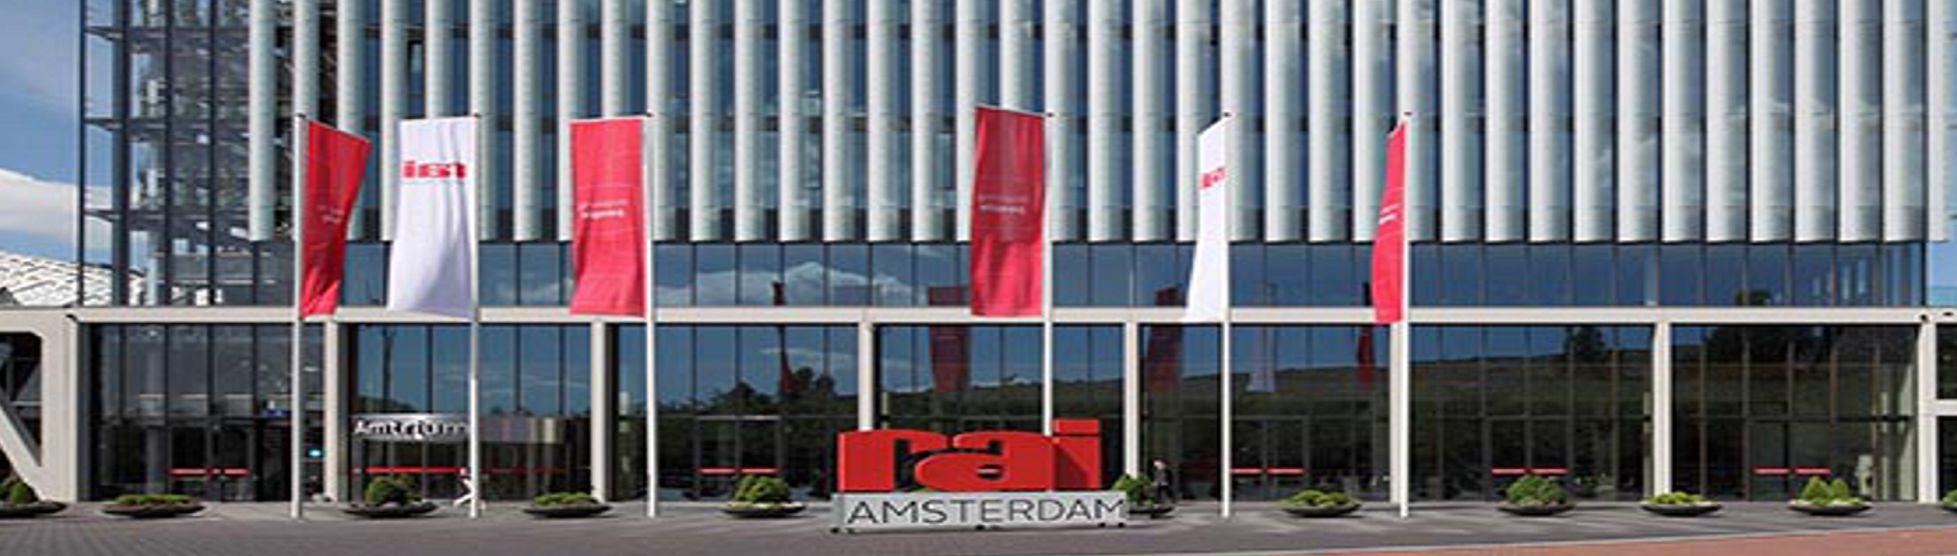 RAI, Amsterdam